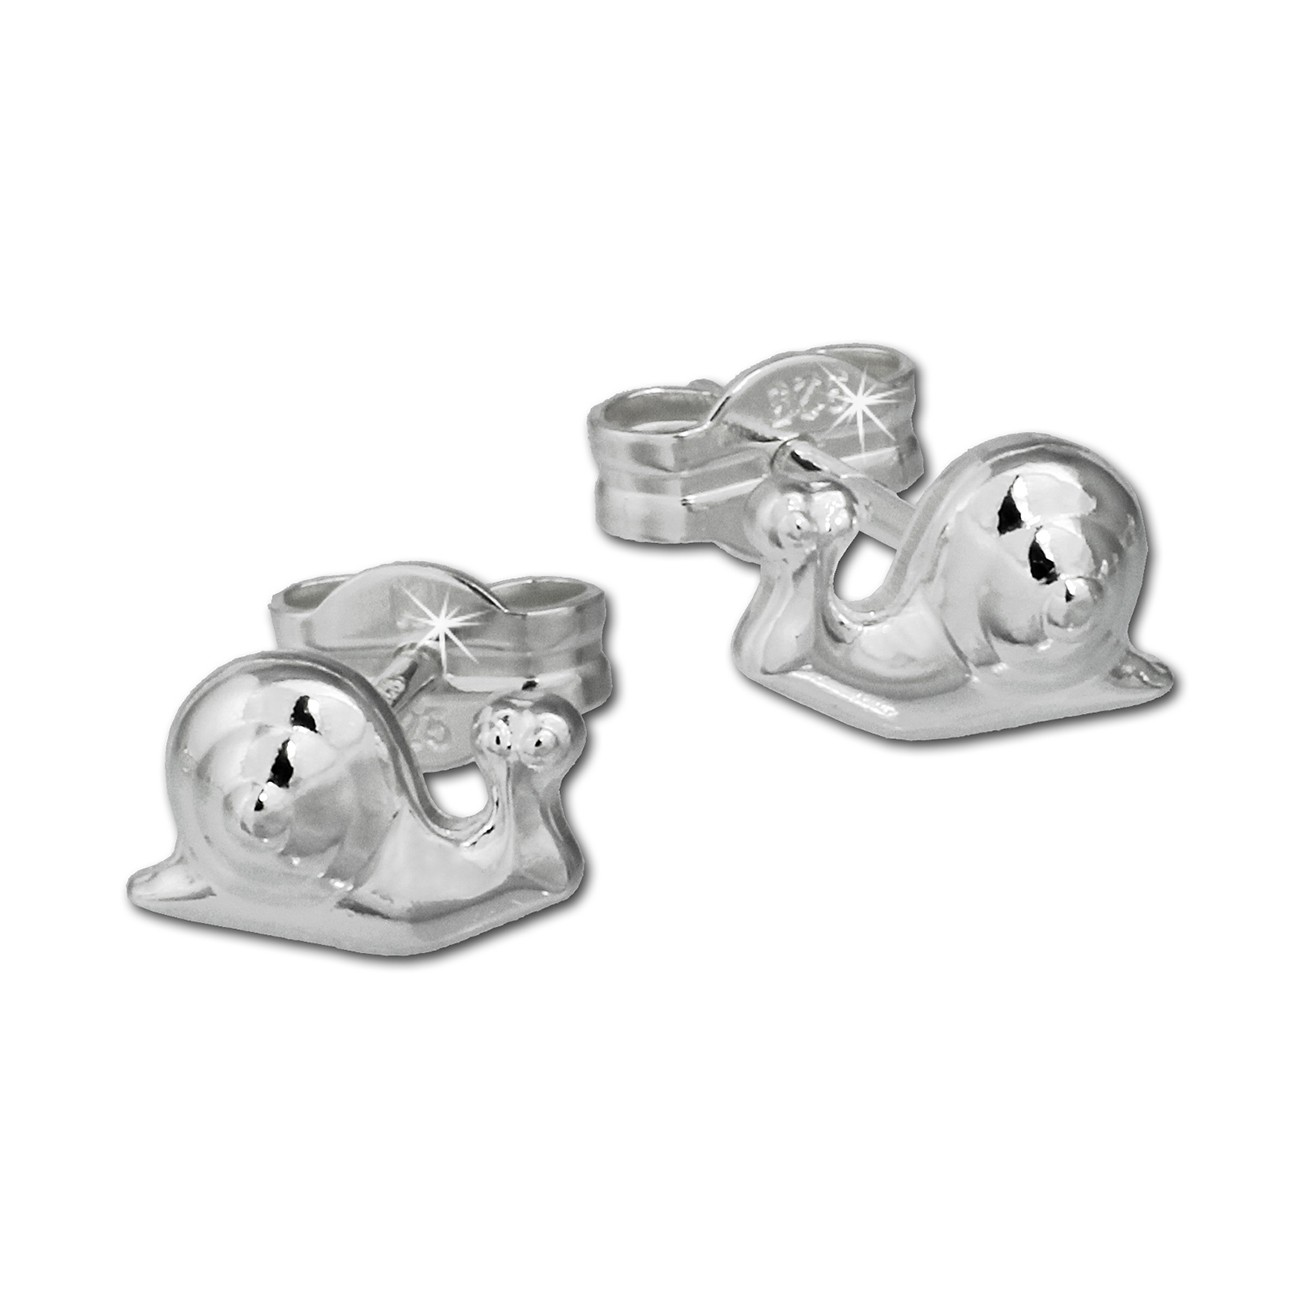 SilberDream Ohrringe Schnecke 925er Silber Ohrstecker SDO557